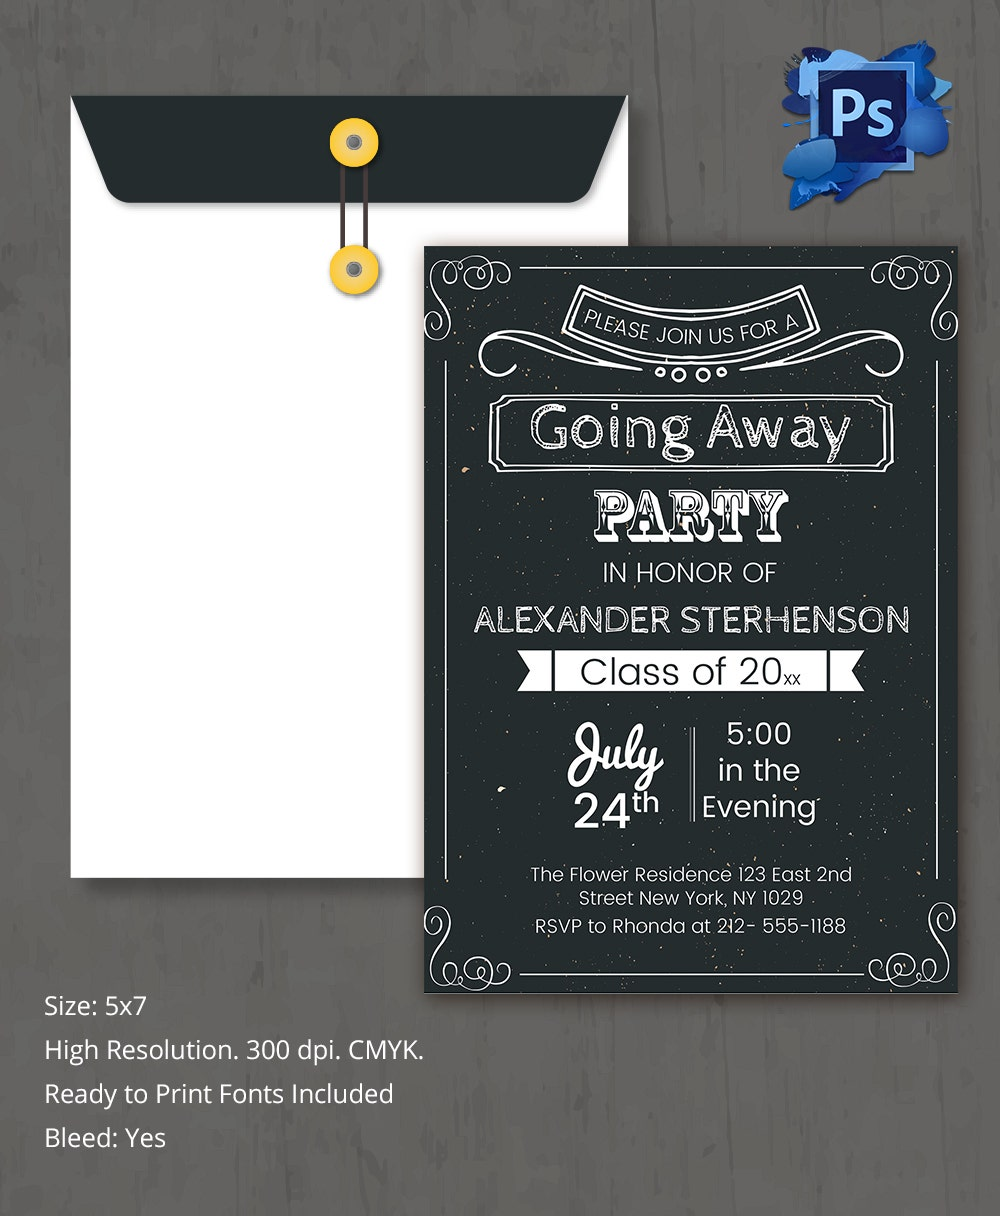 Goingawayparty_invitation1